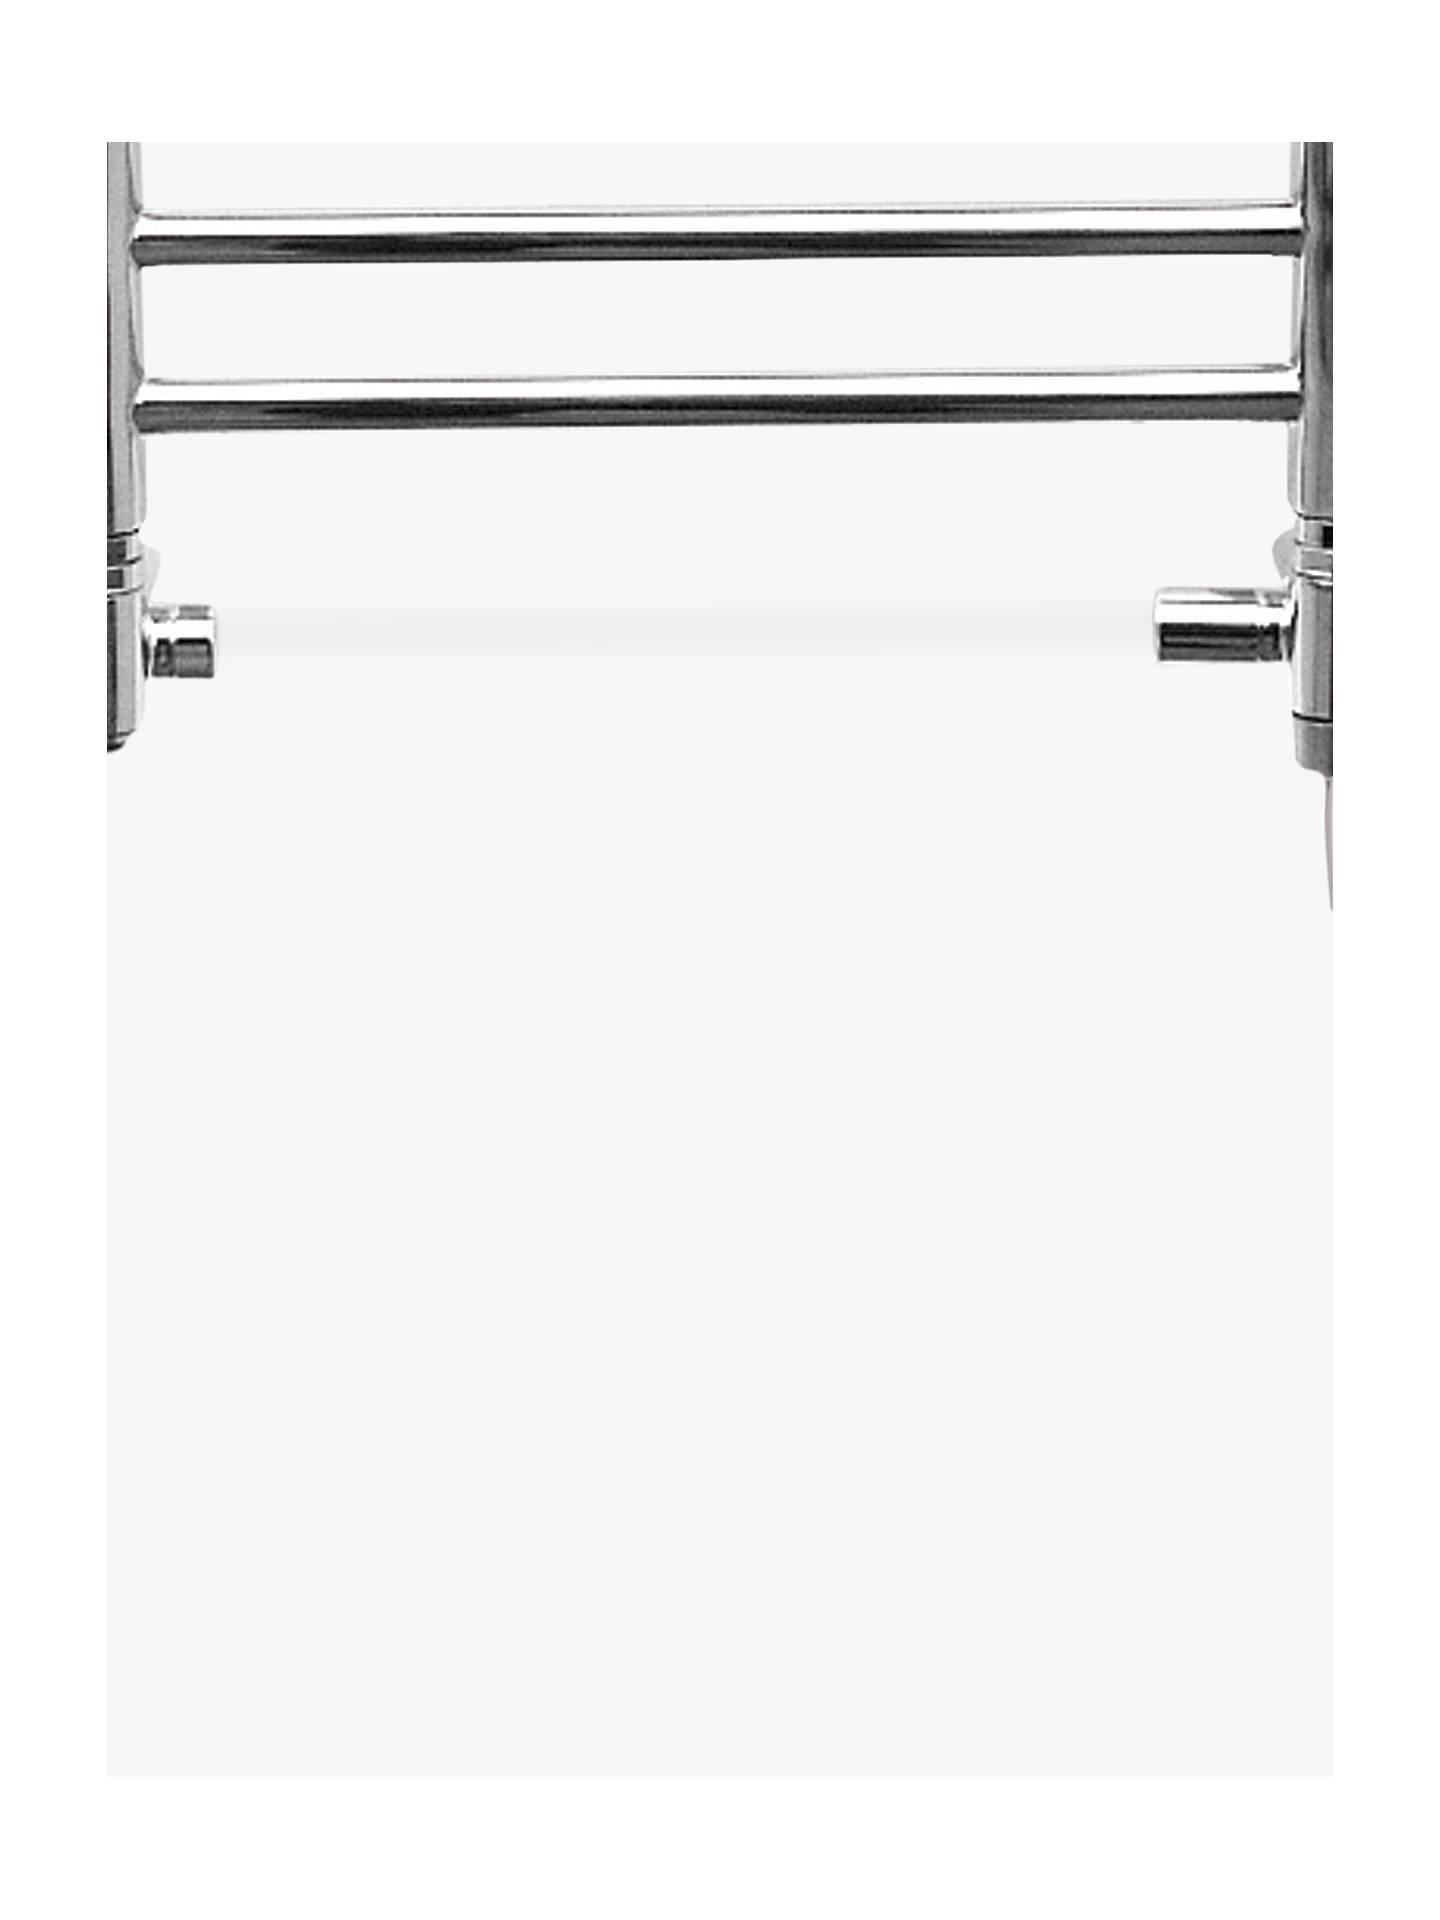 john lewis partners holkham dual fuel heated towel rail. Black Bedroom Furniture Sets. Home Design Ideas